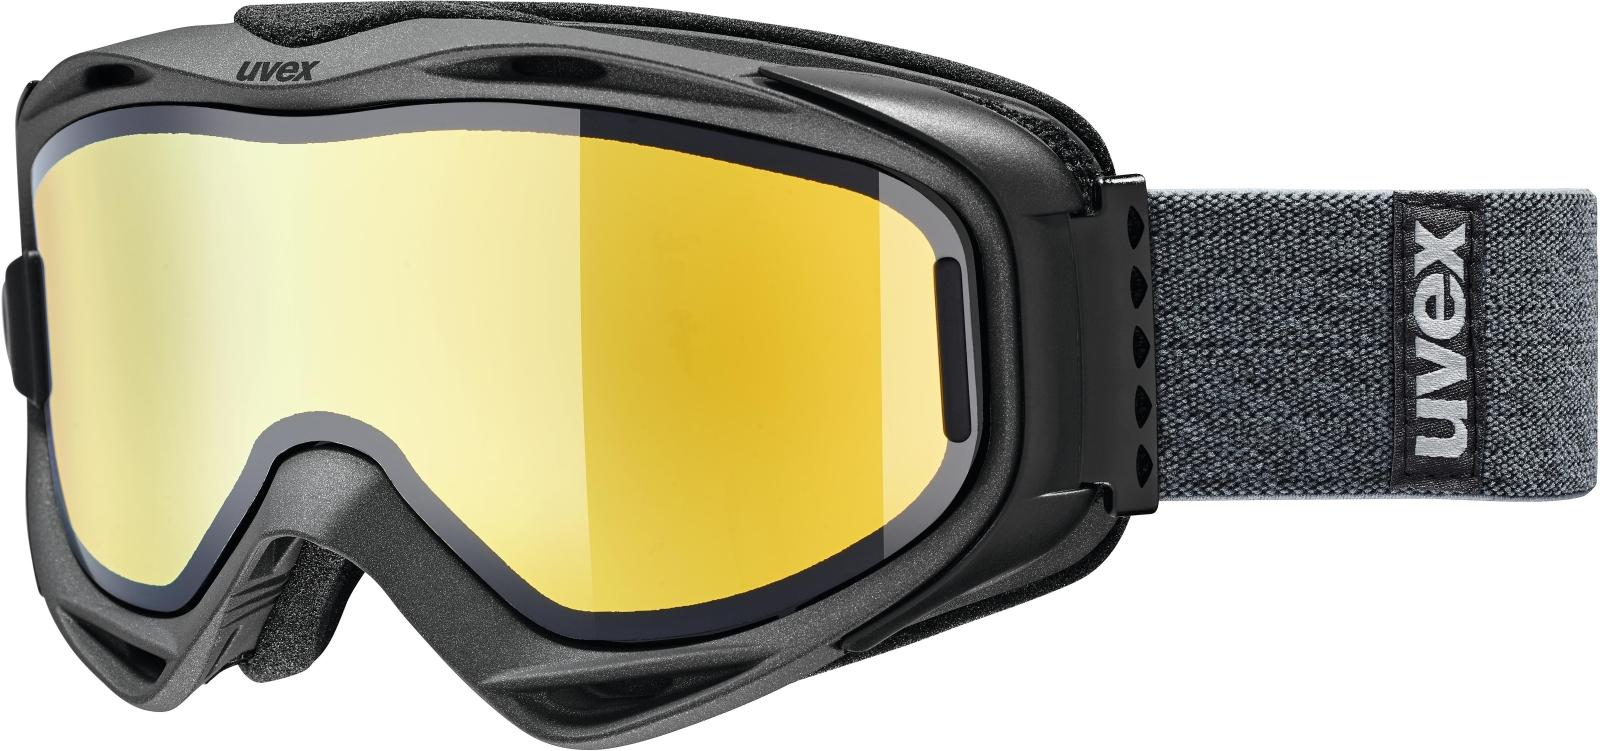 45a3513bde4 Lyžařské brýle Uvex G.Gl 300 TO Anthracite Mat DL mirror yellow  (S2) lasergold lite rose (S4)